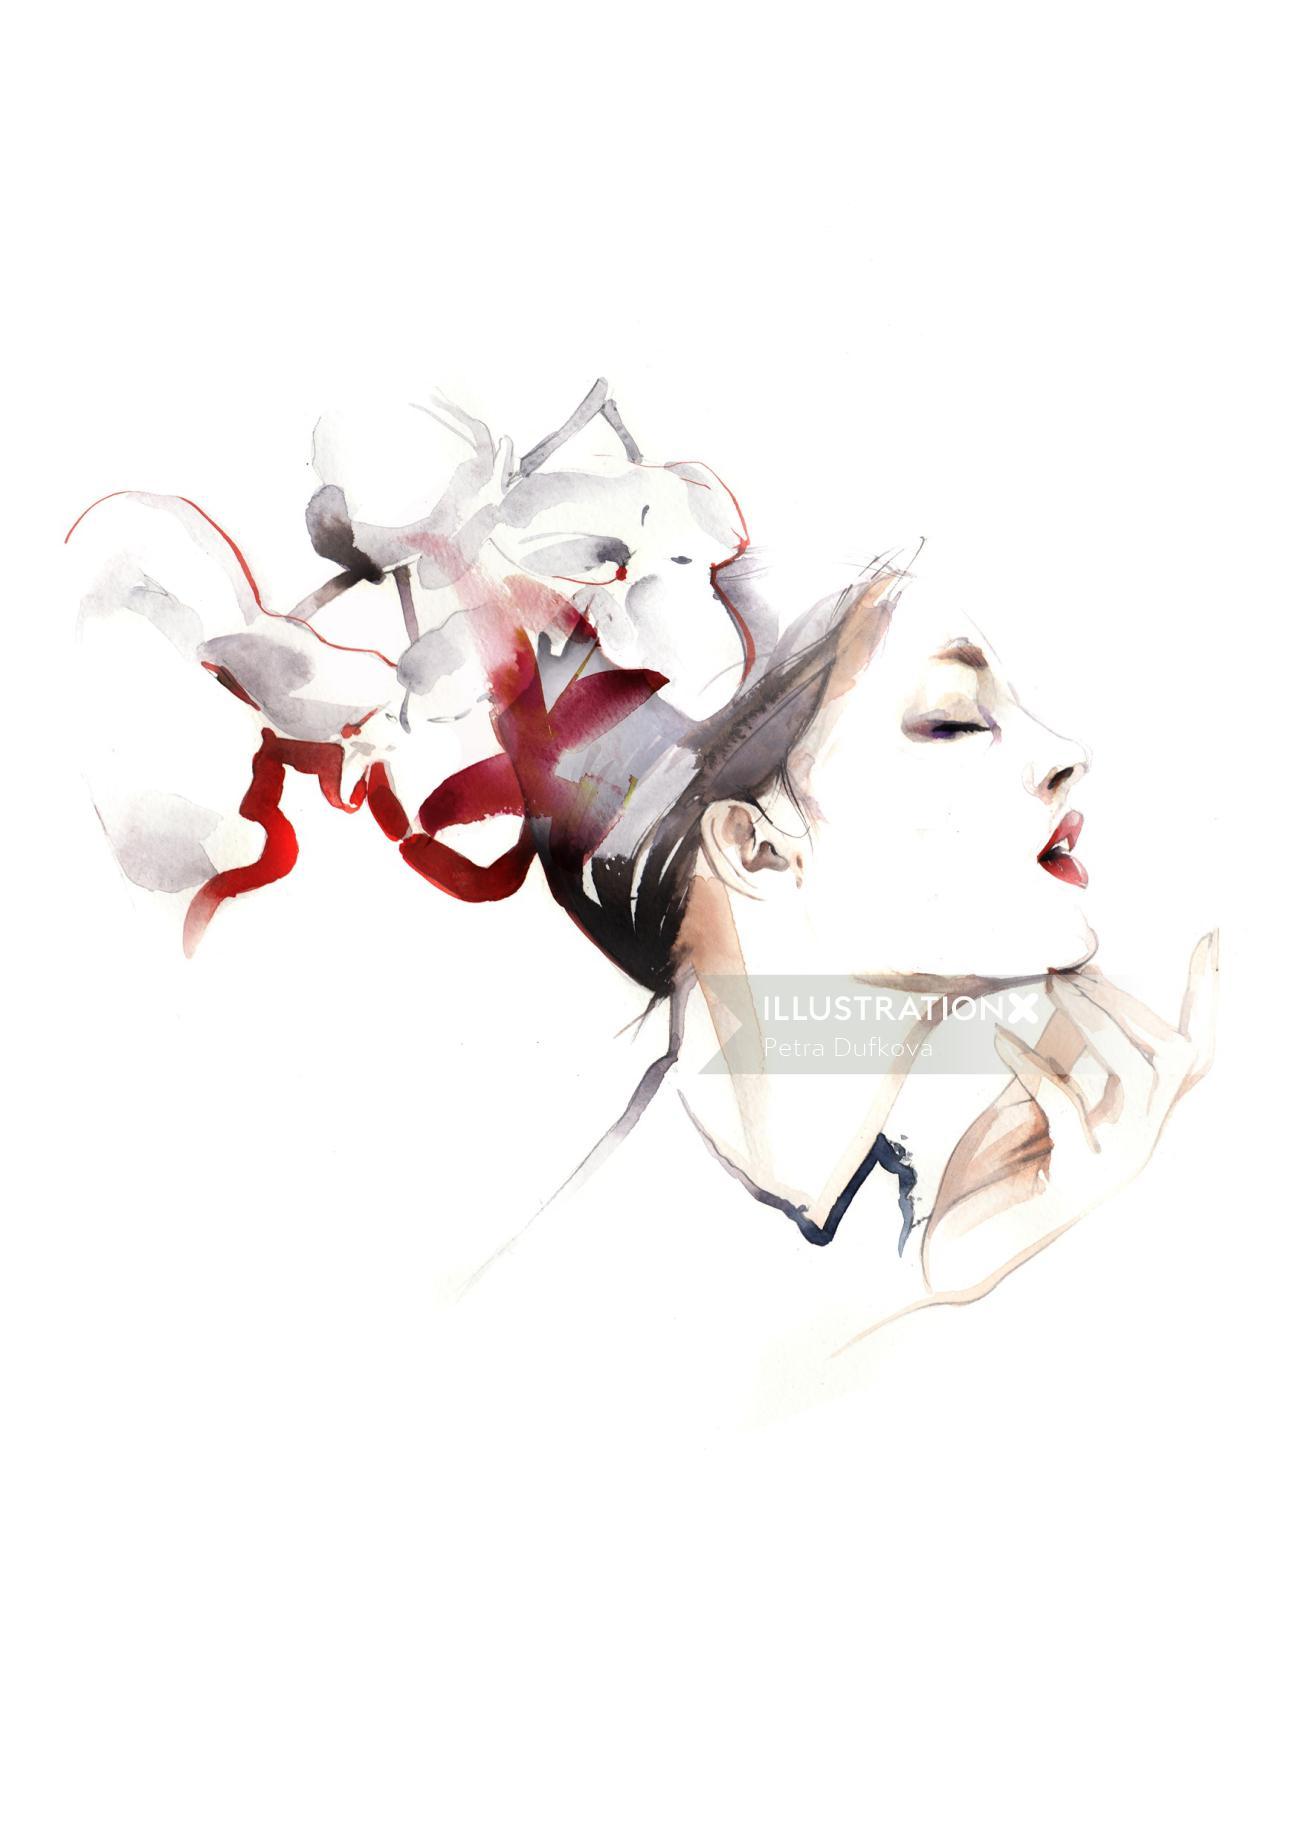 watercolor beauty illustration of female model